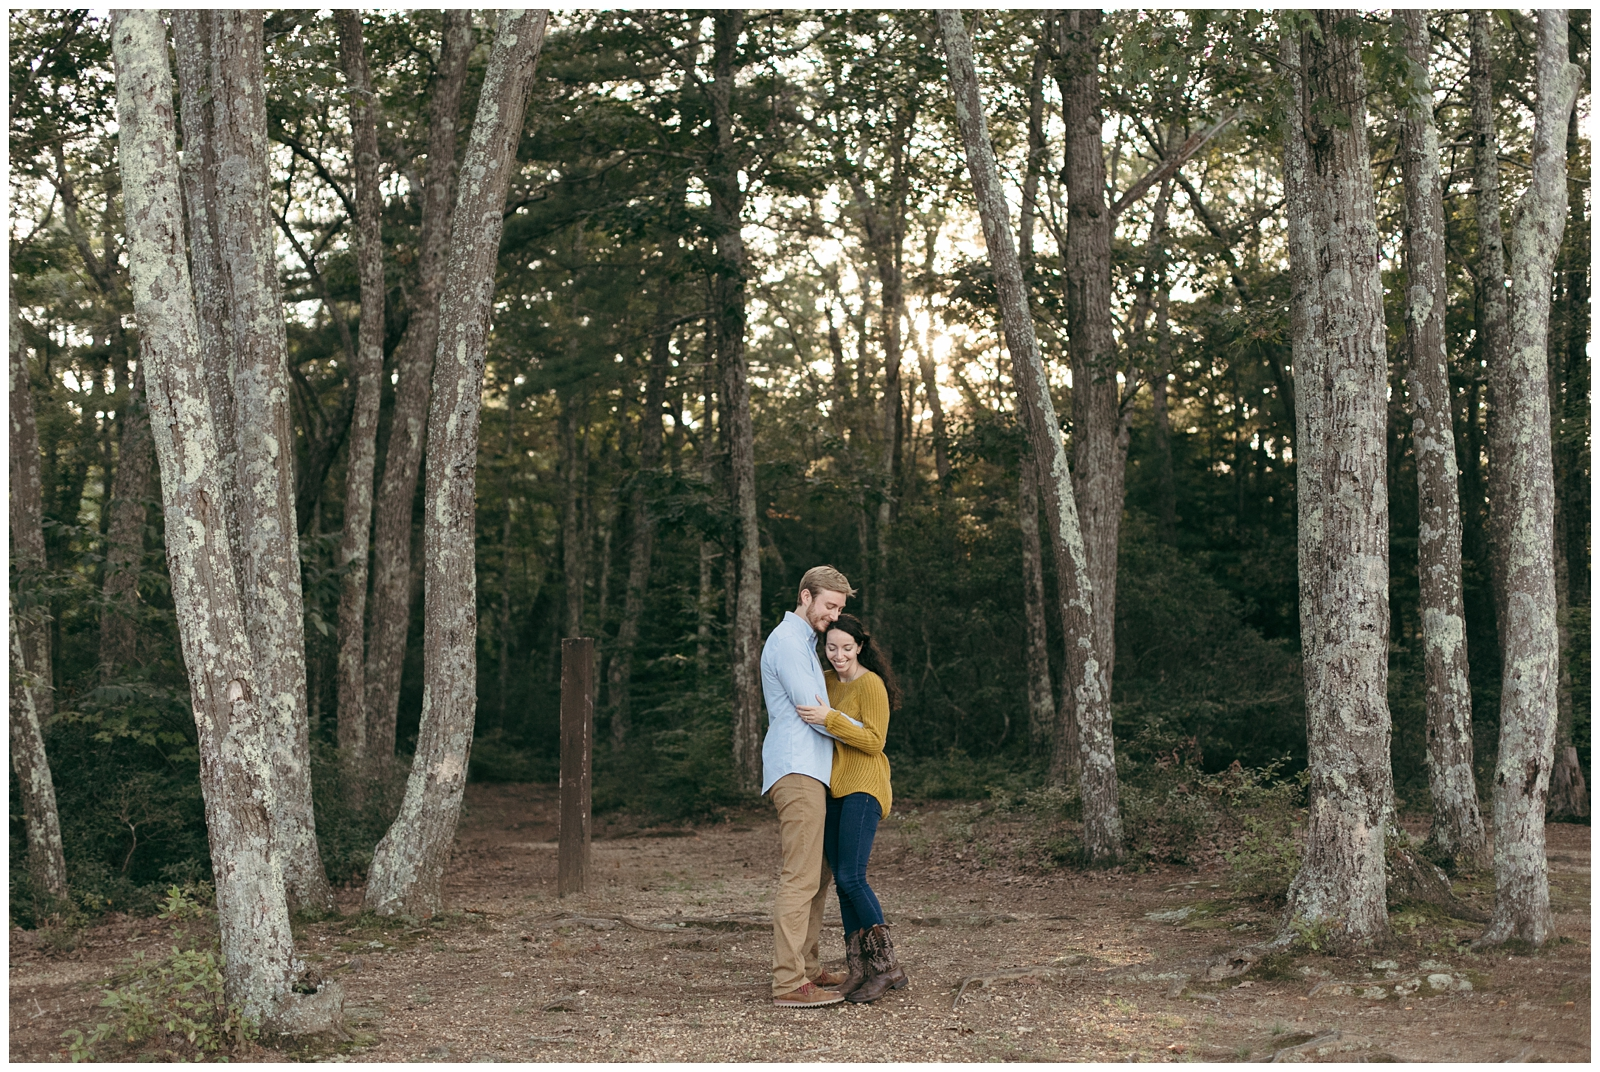 Connecticut-Engagement-Photographer-Bailey-Q-Photo-25.jpg